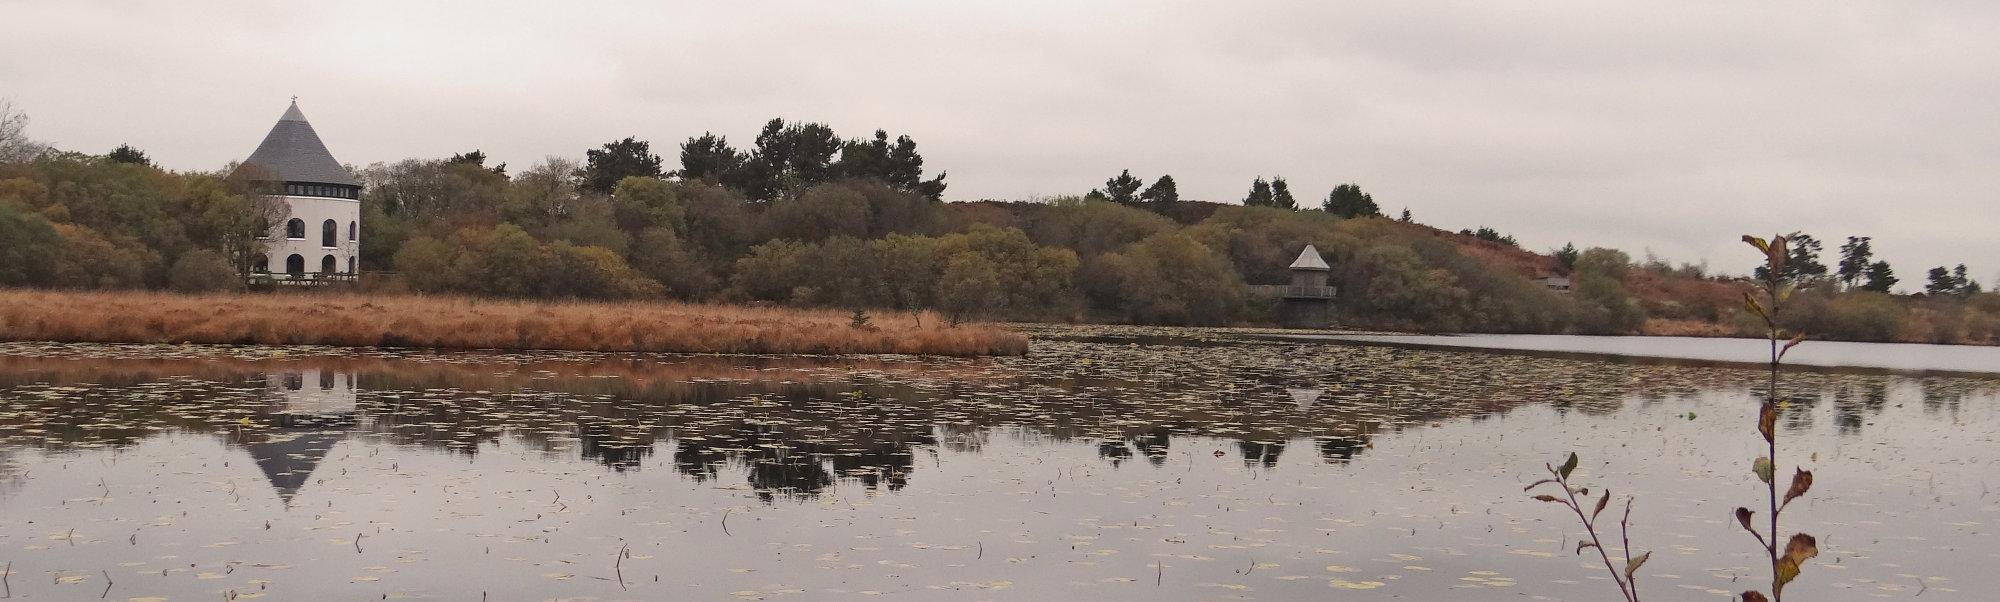 LLYN LLECH OWAIN Local Lake